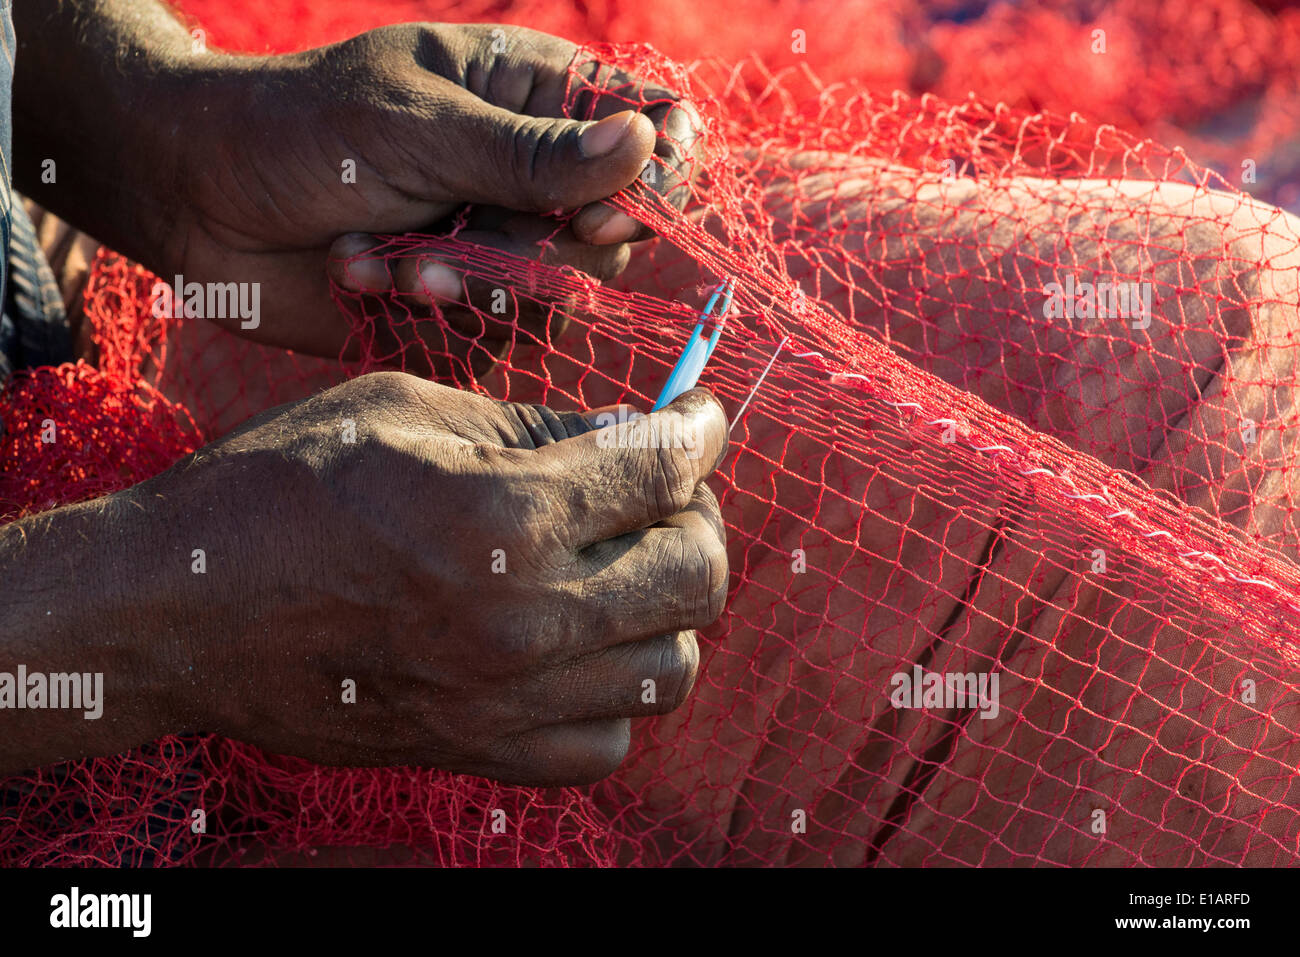 Les mains d'un pêcheur réparant les filets de pêche, Munnar, Kerala, Inde Photo Stock